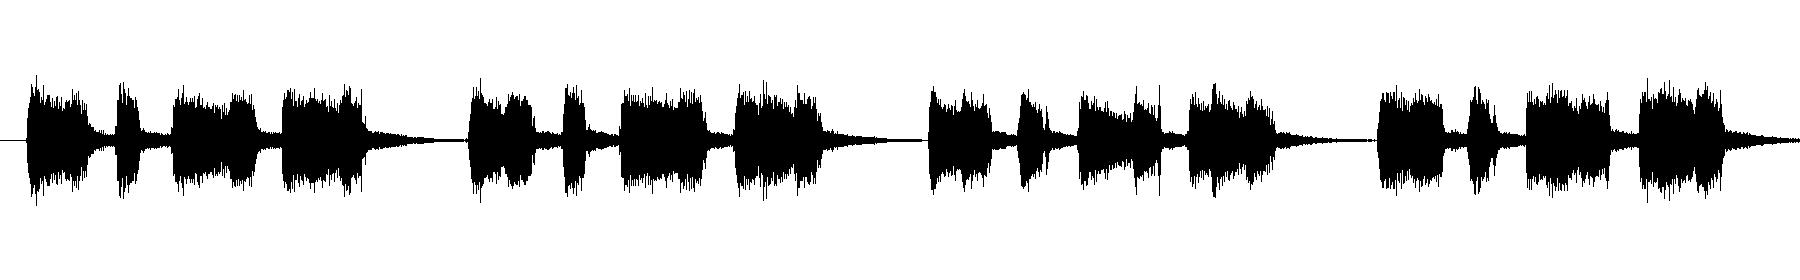 7th heaven electric riff